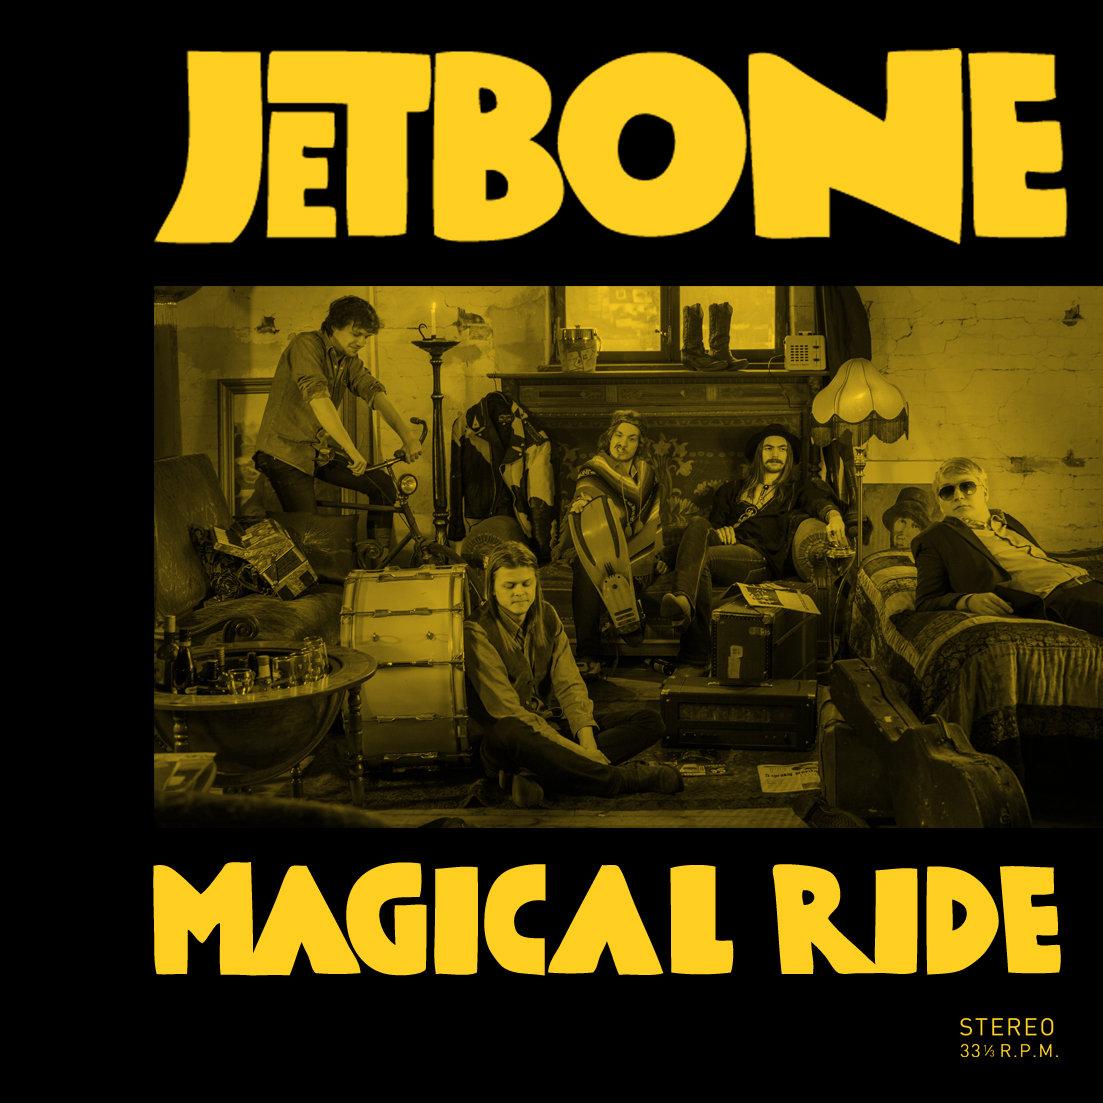 JETBONE – Magical Ride (2016)